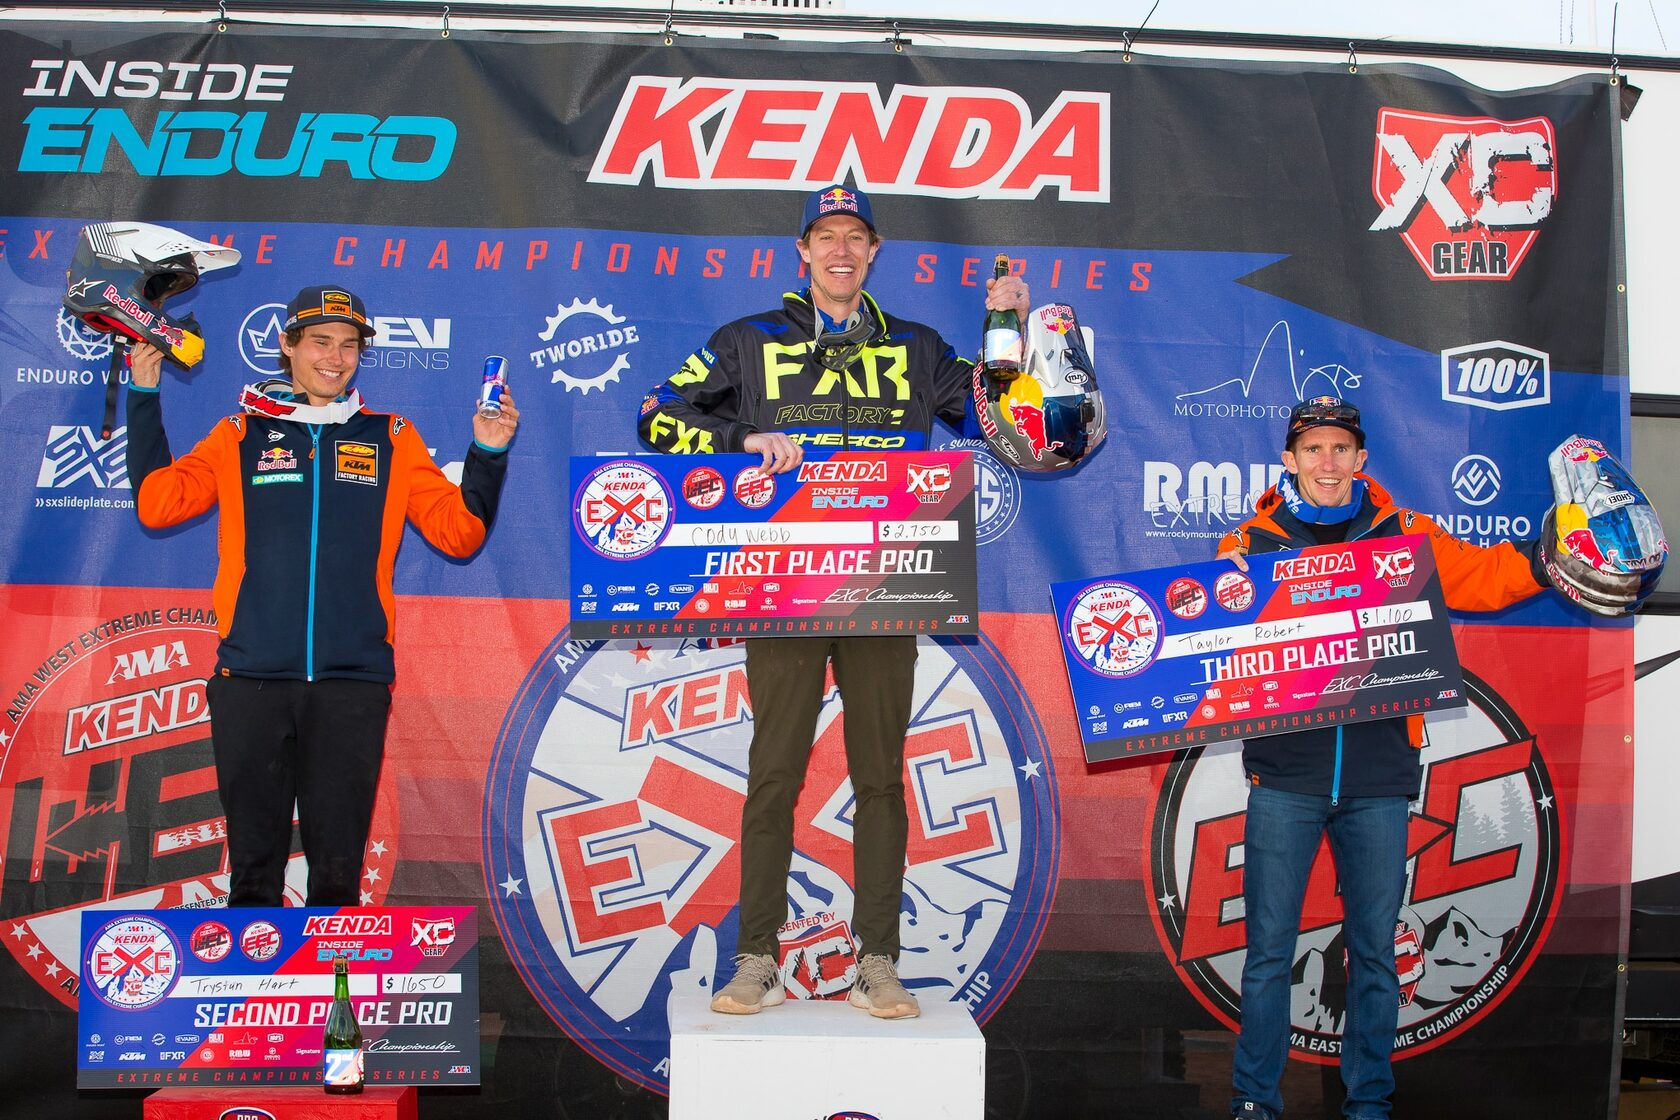 Kenda AMA Extreme Enduro series: Коди Уэбб – победитель первого этапа в Аризоне